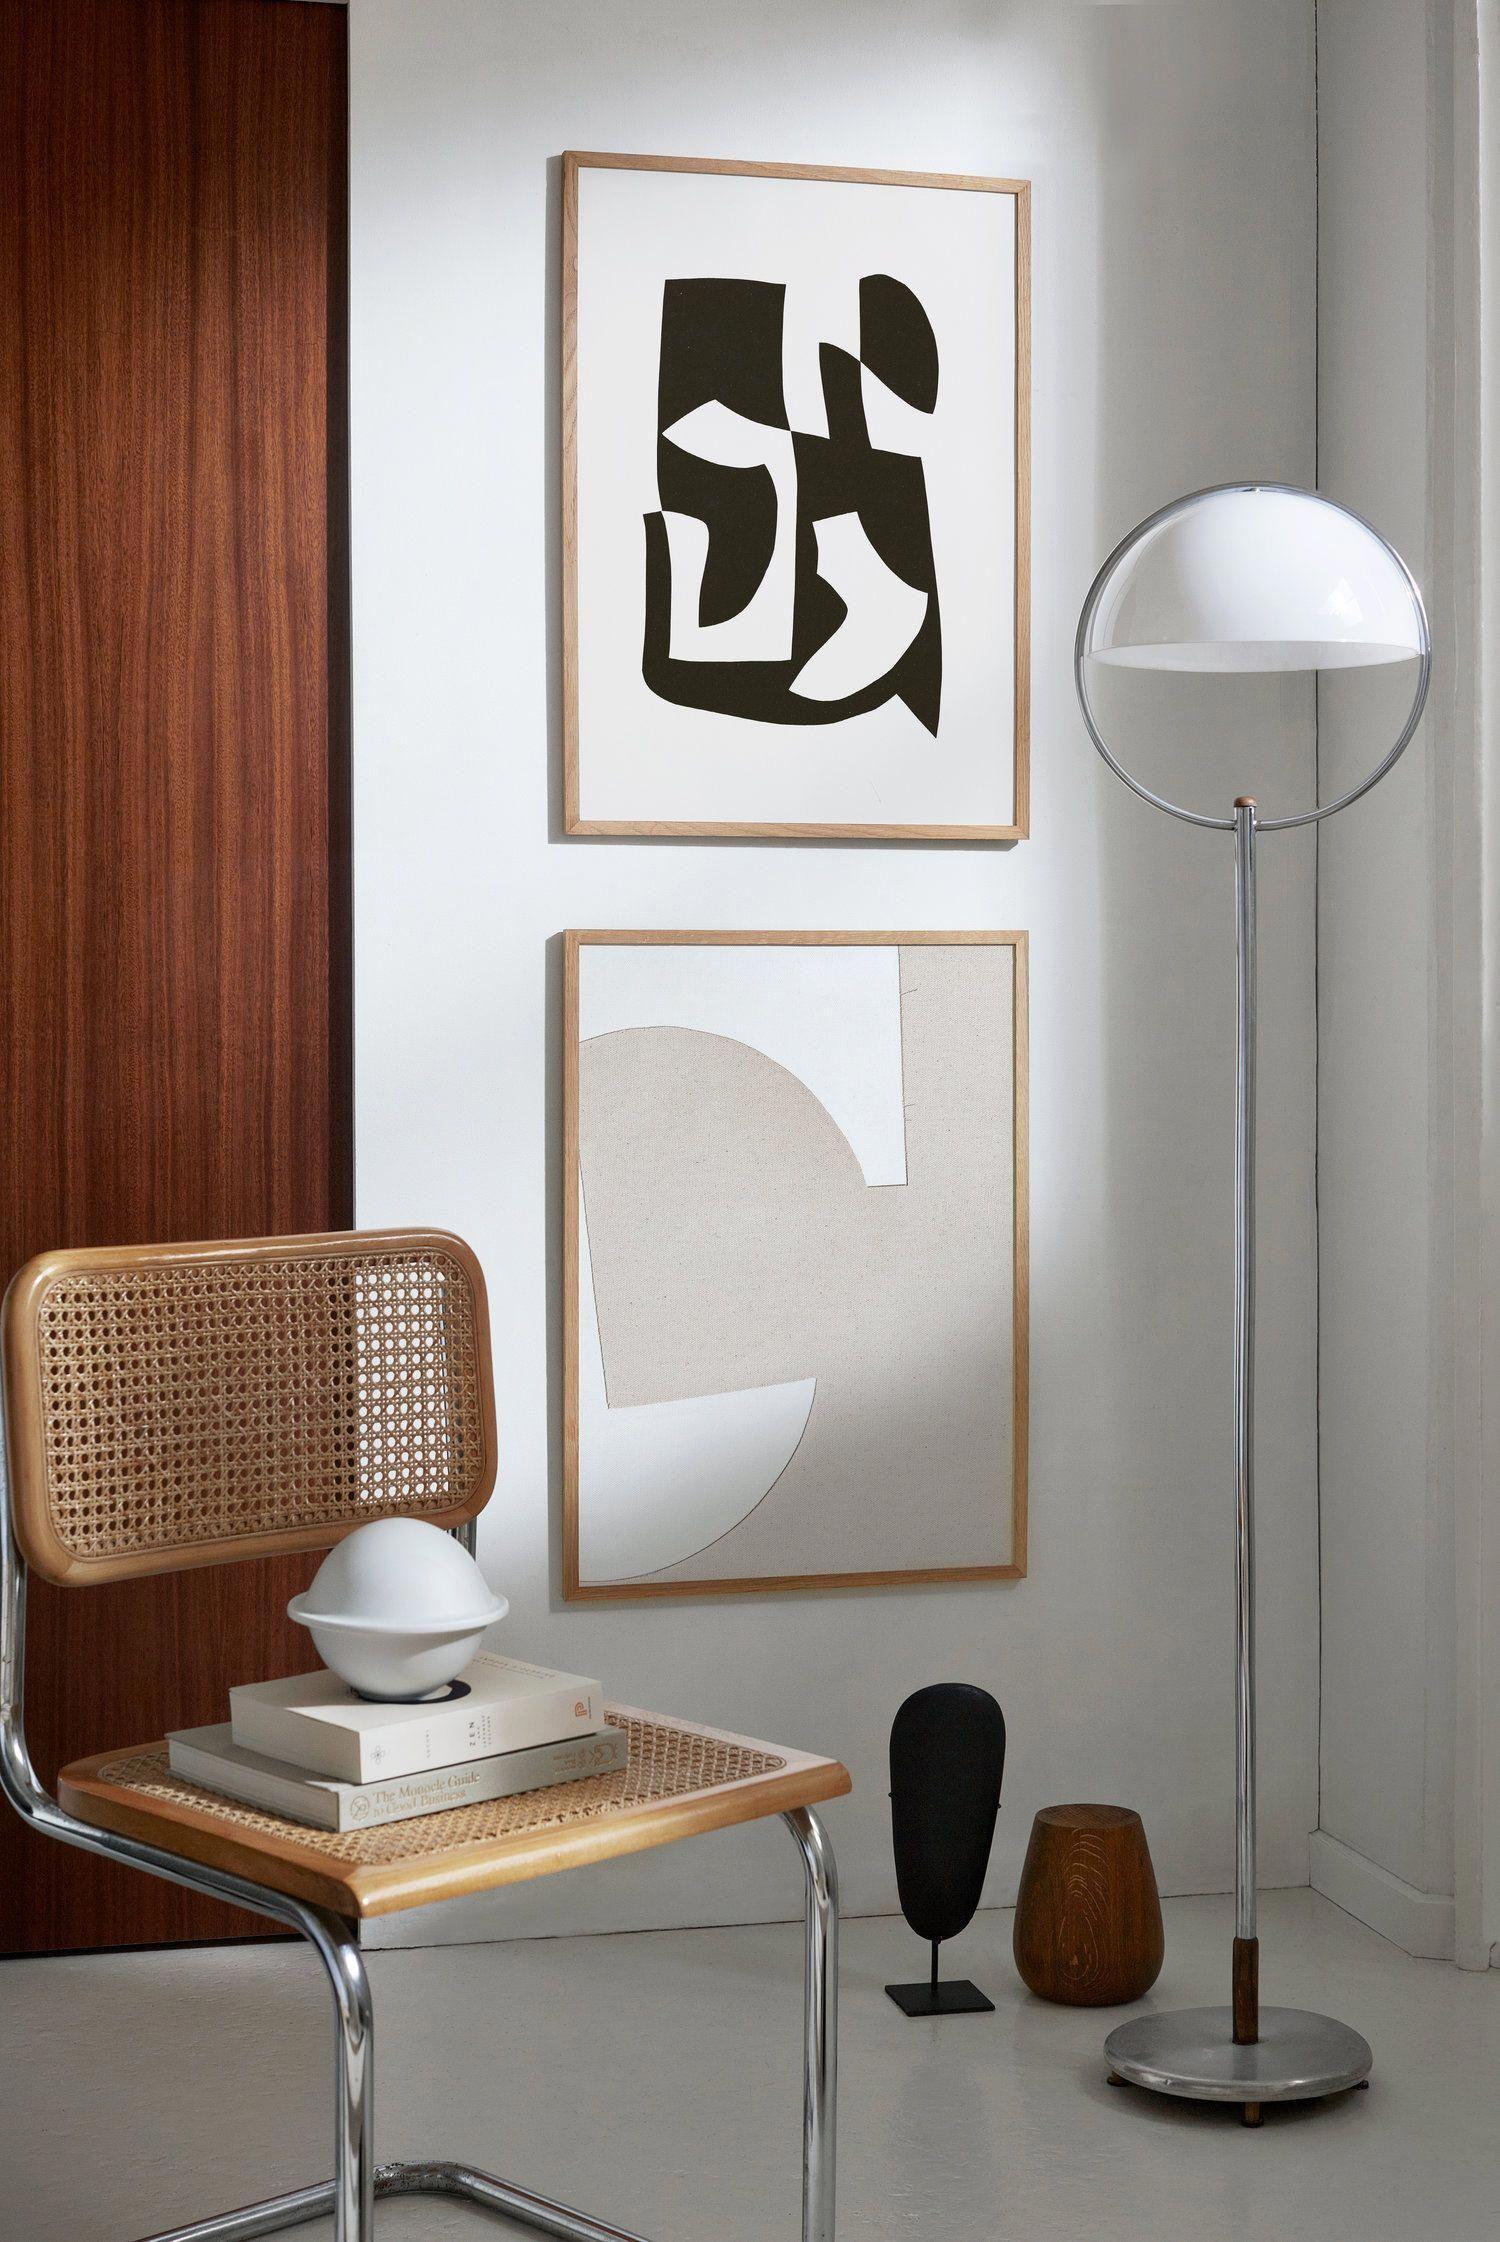 Design Cove Prints 25 24jpg interiordesignstyles Interior Styling